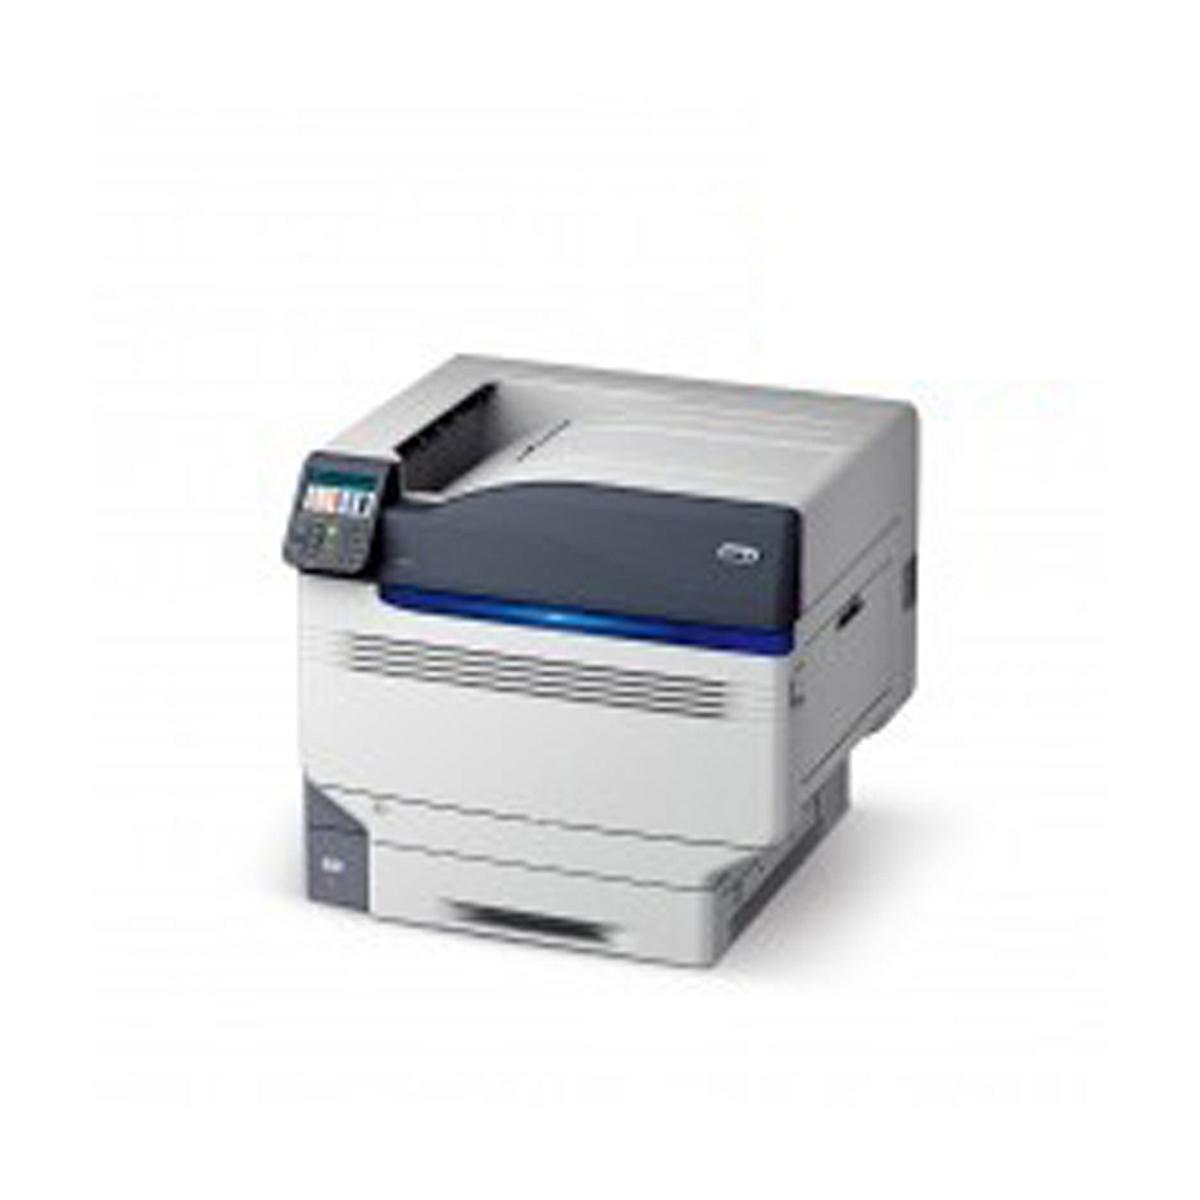 OKI C911dn 彩色激光打印机 1200*1200dpi (单位:台)